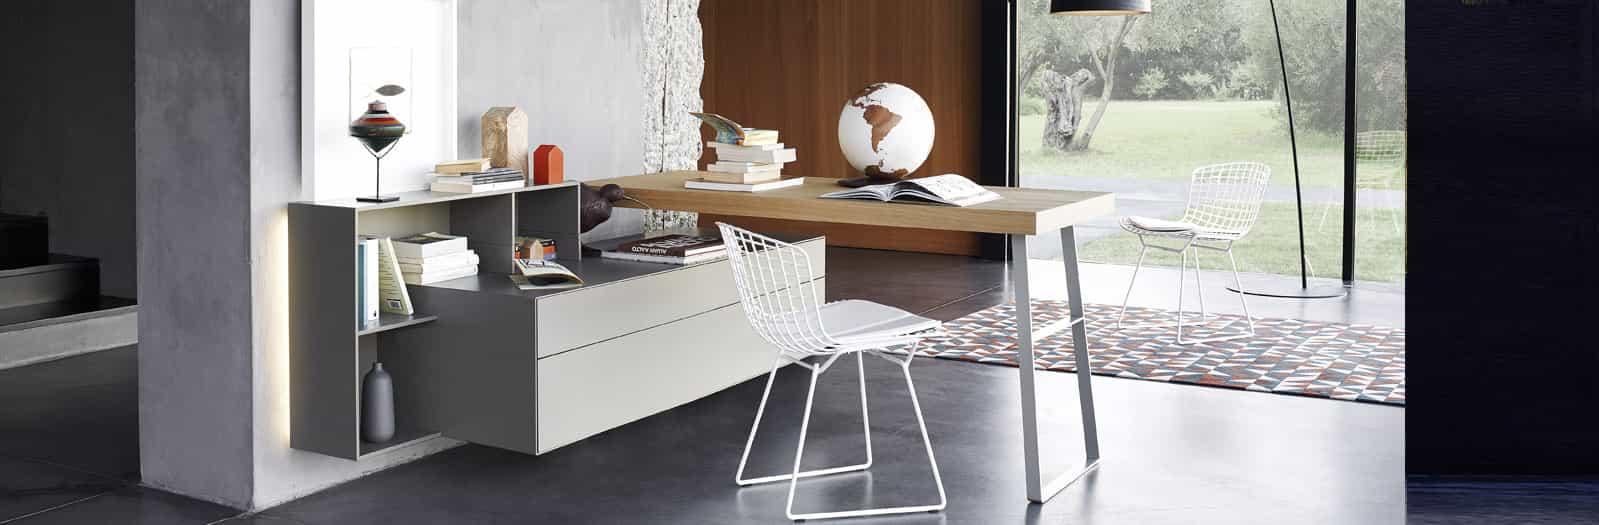 SANGIACOMO Hálószoba bútor